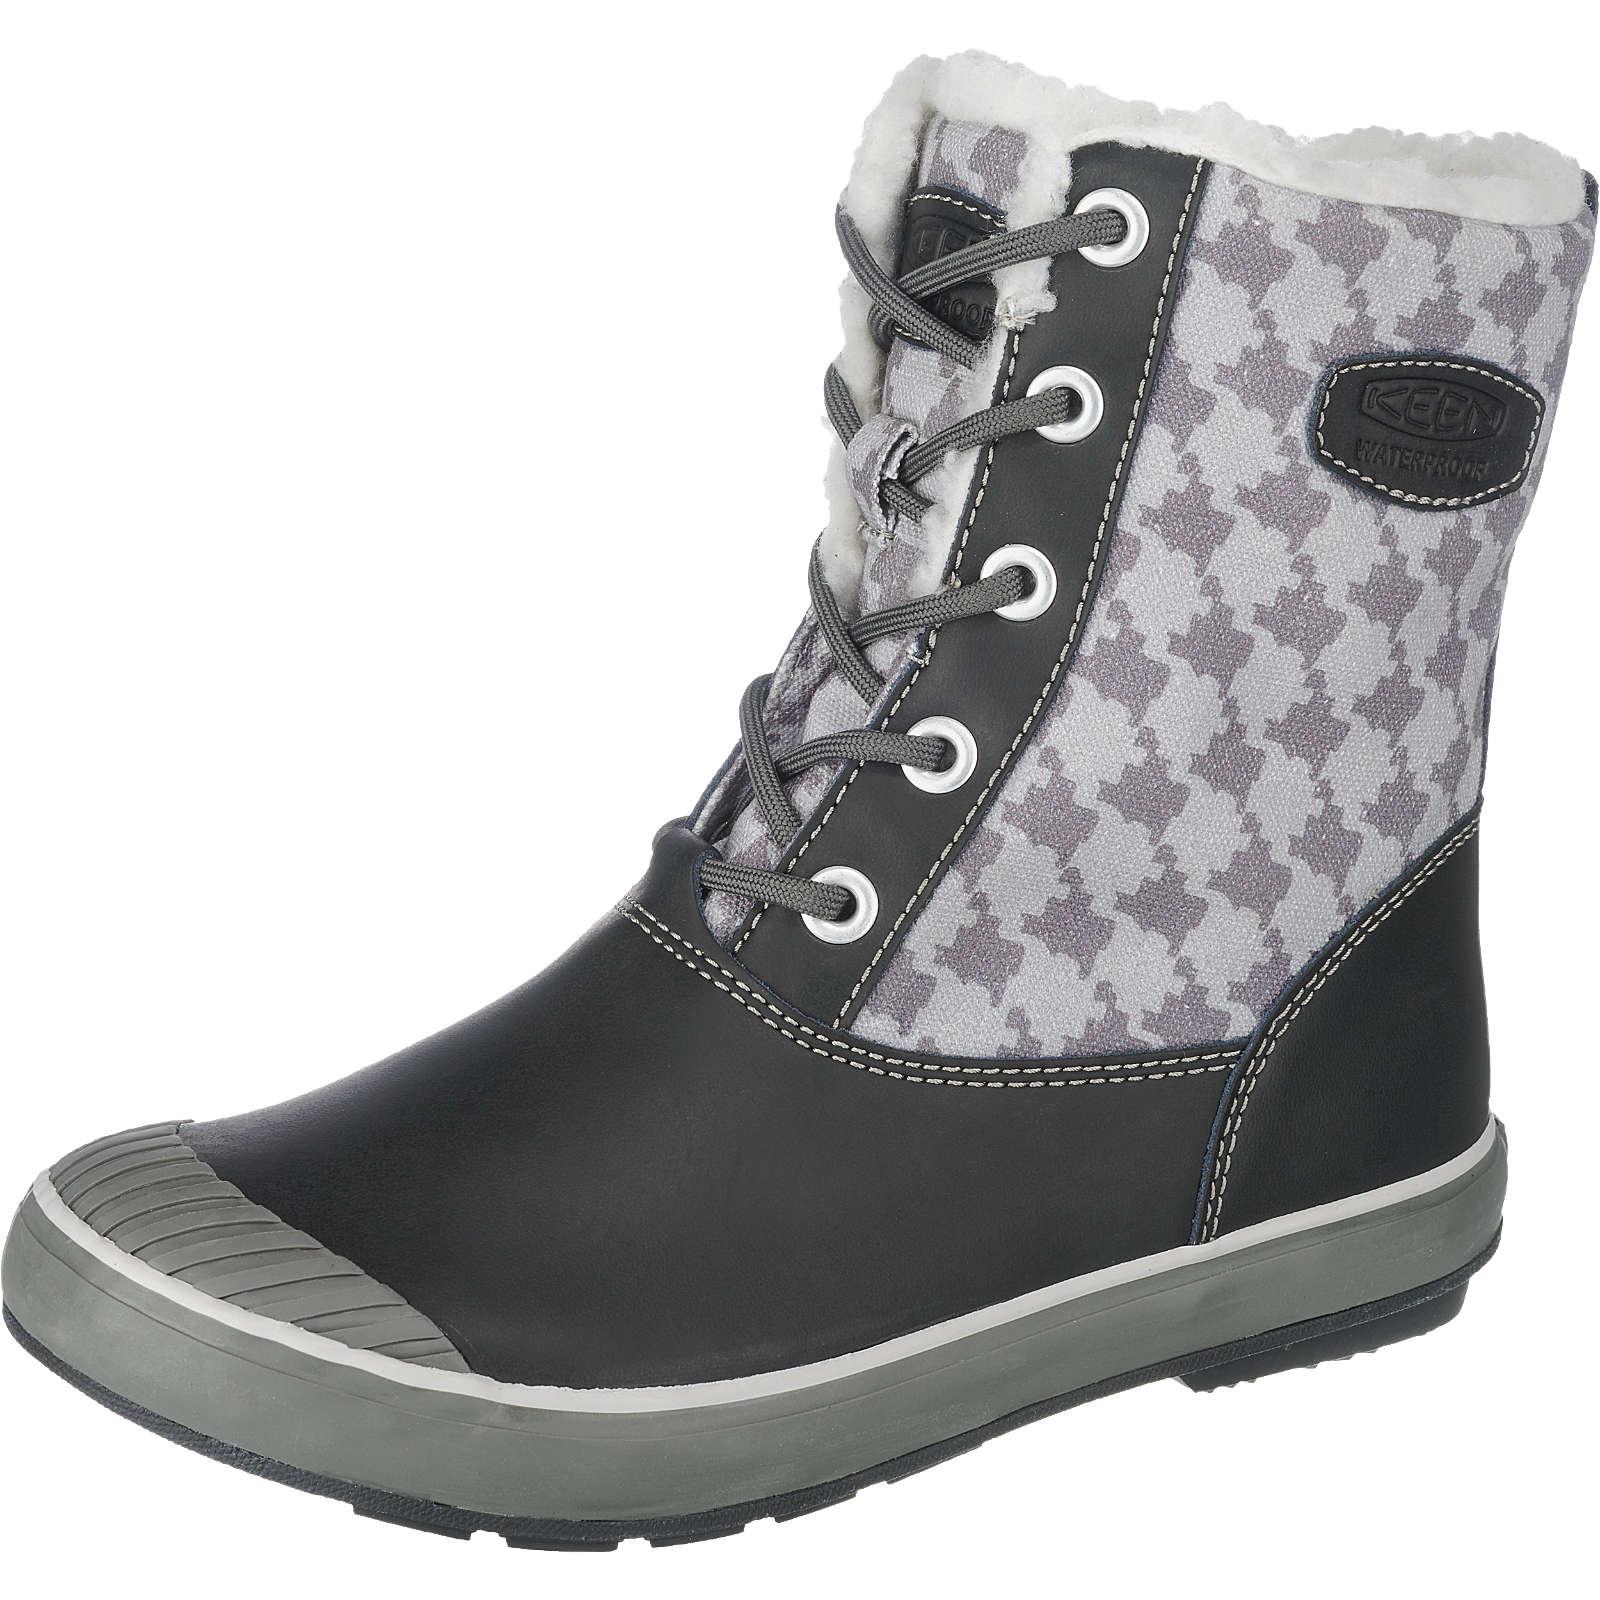 KEEN Elsa Boot Waterproof Stiefel schwarz-kombi Damen Gr. 39,5